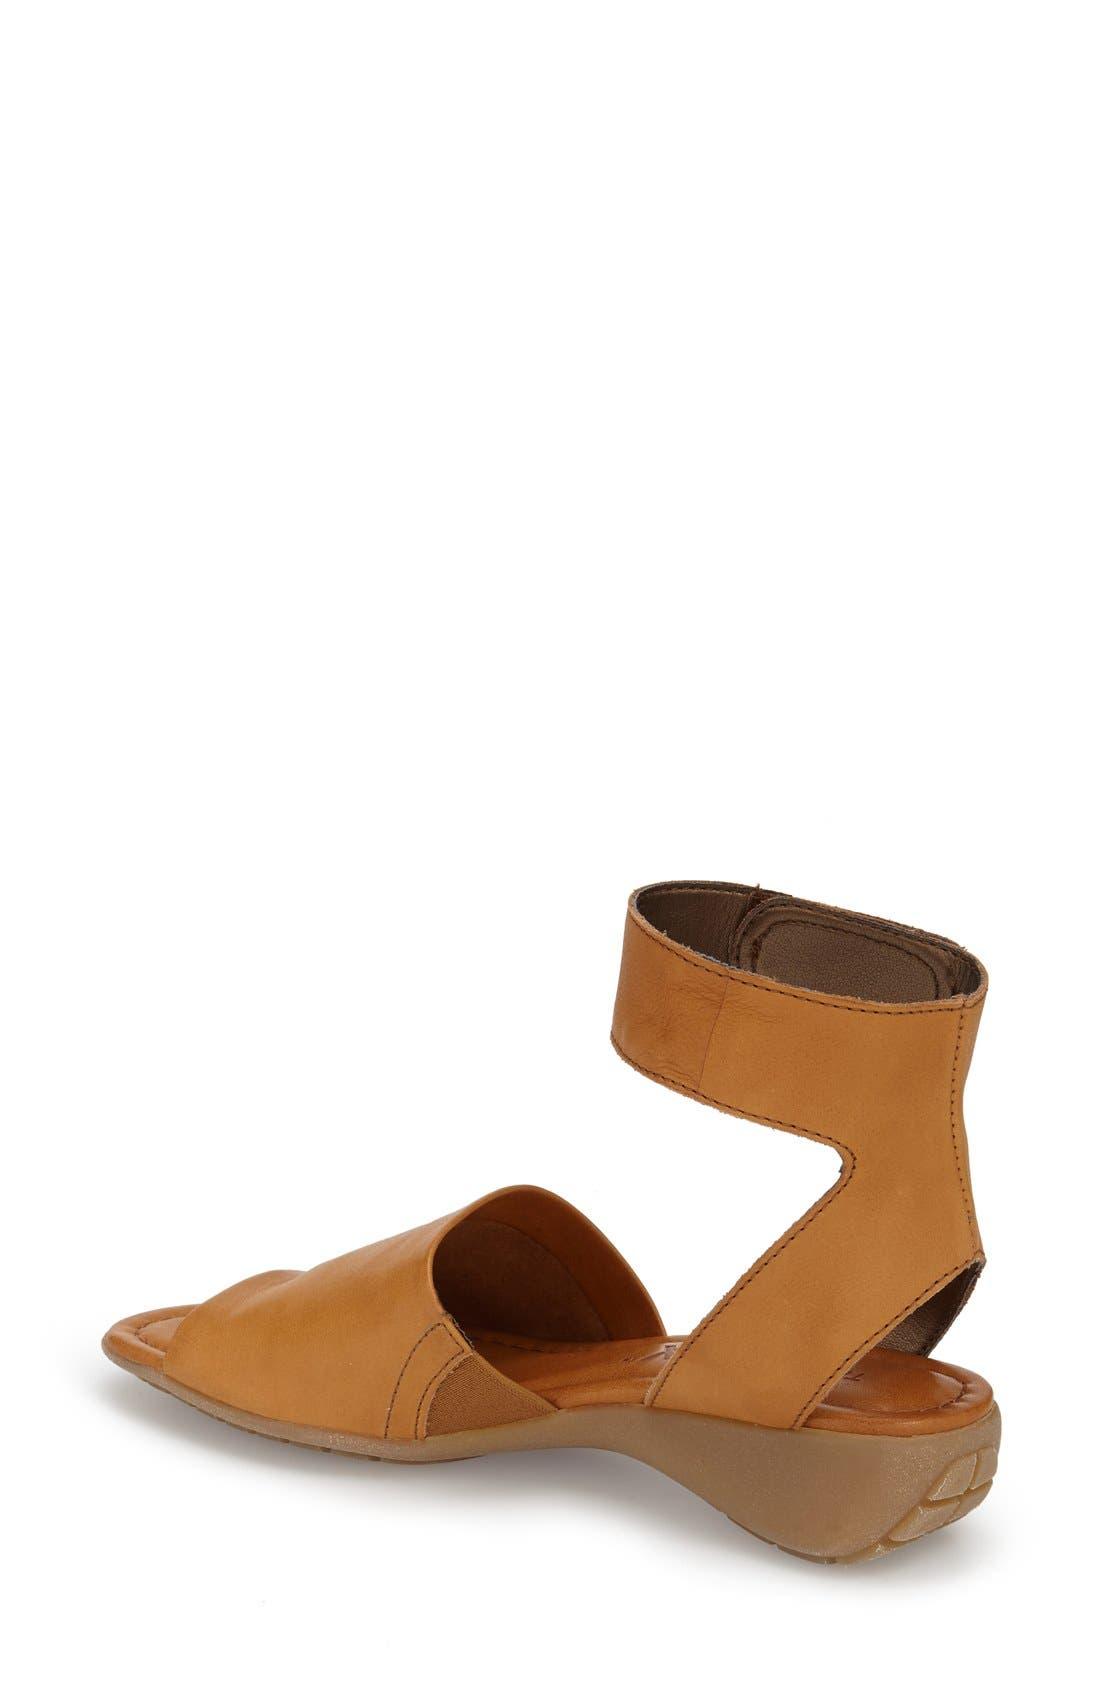 'Beglad' Leather Ankle Strap Sandal,                             Alternate thumbnail 60, color,